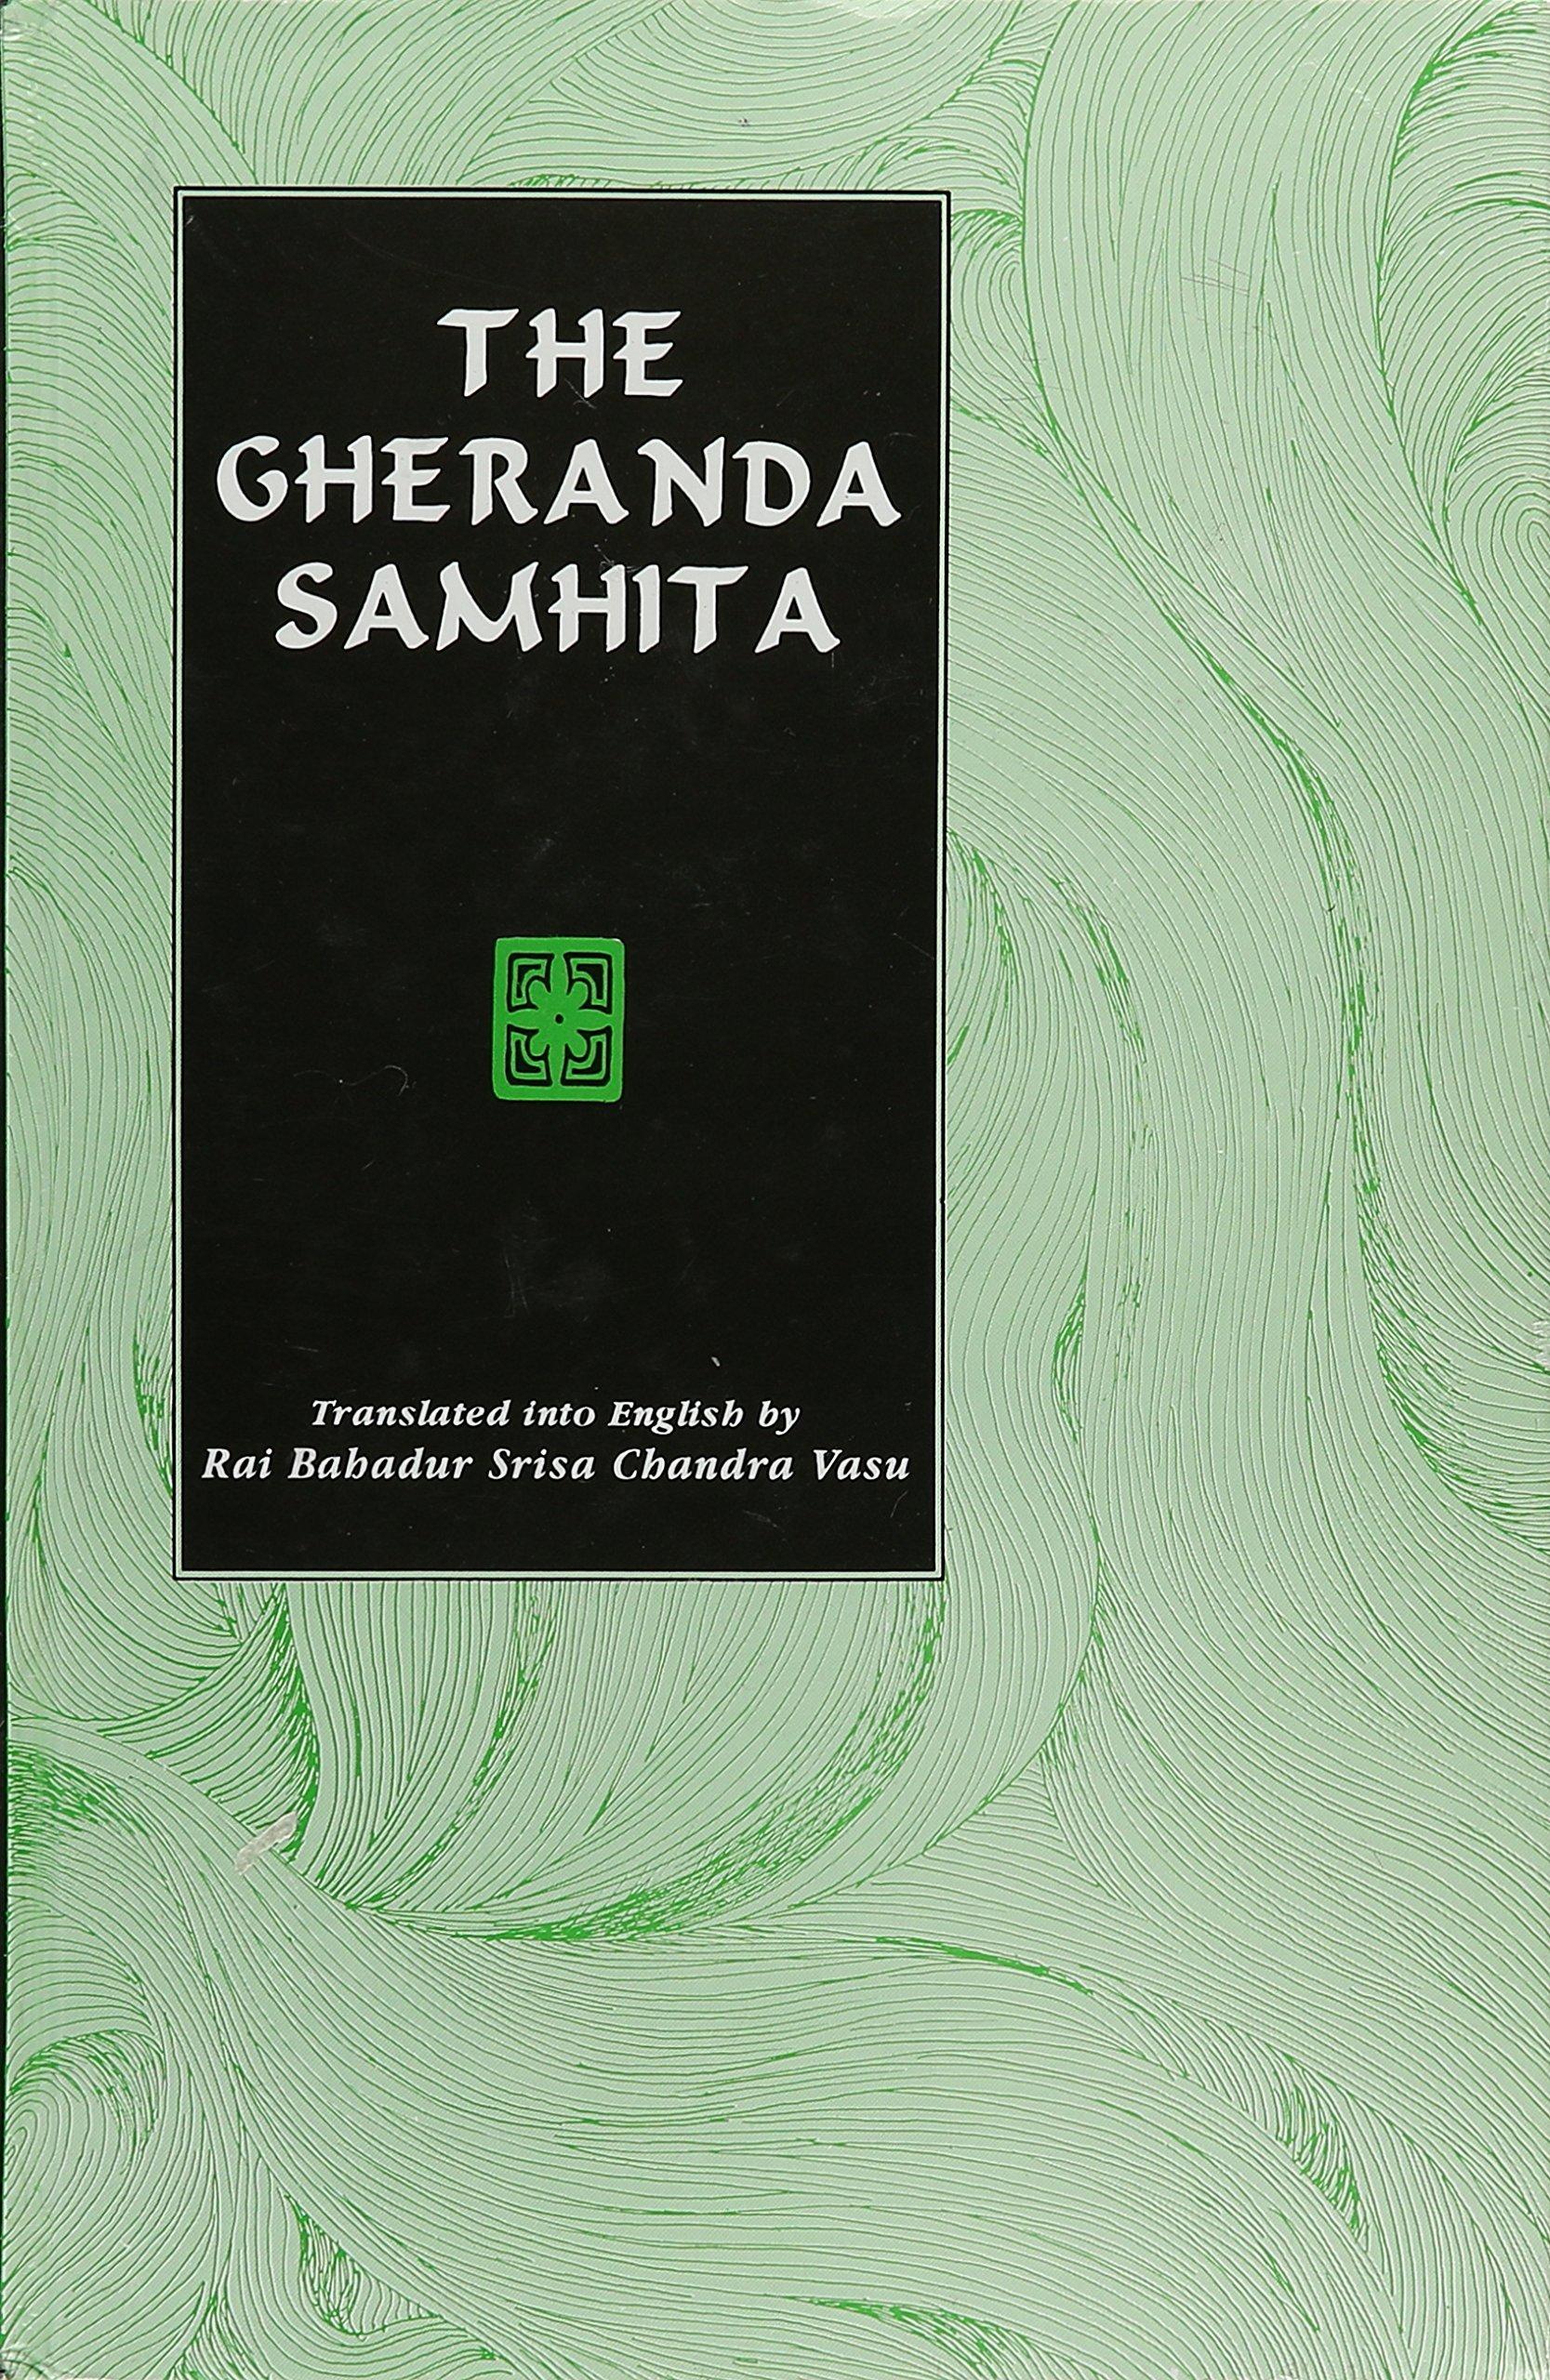 Download free gheranda samhita in hindi.